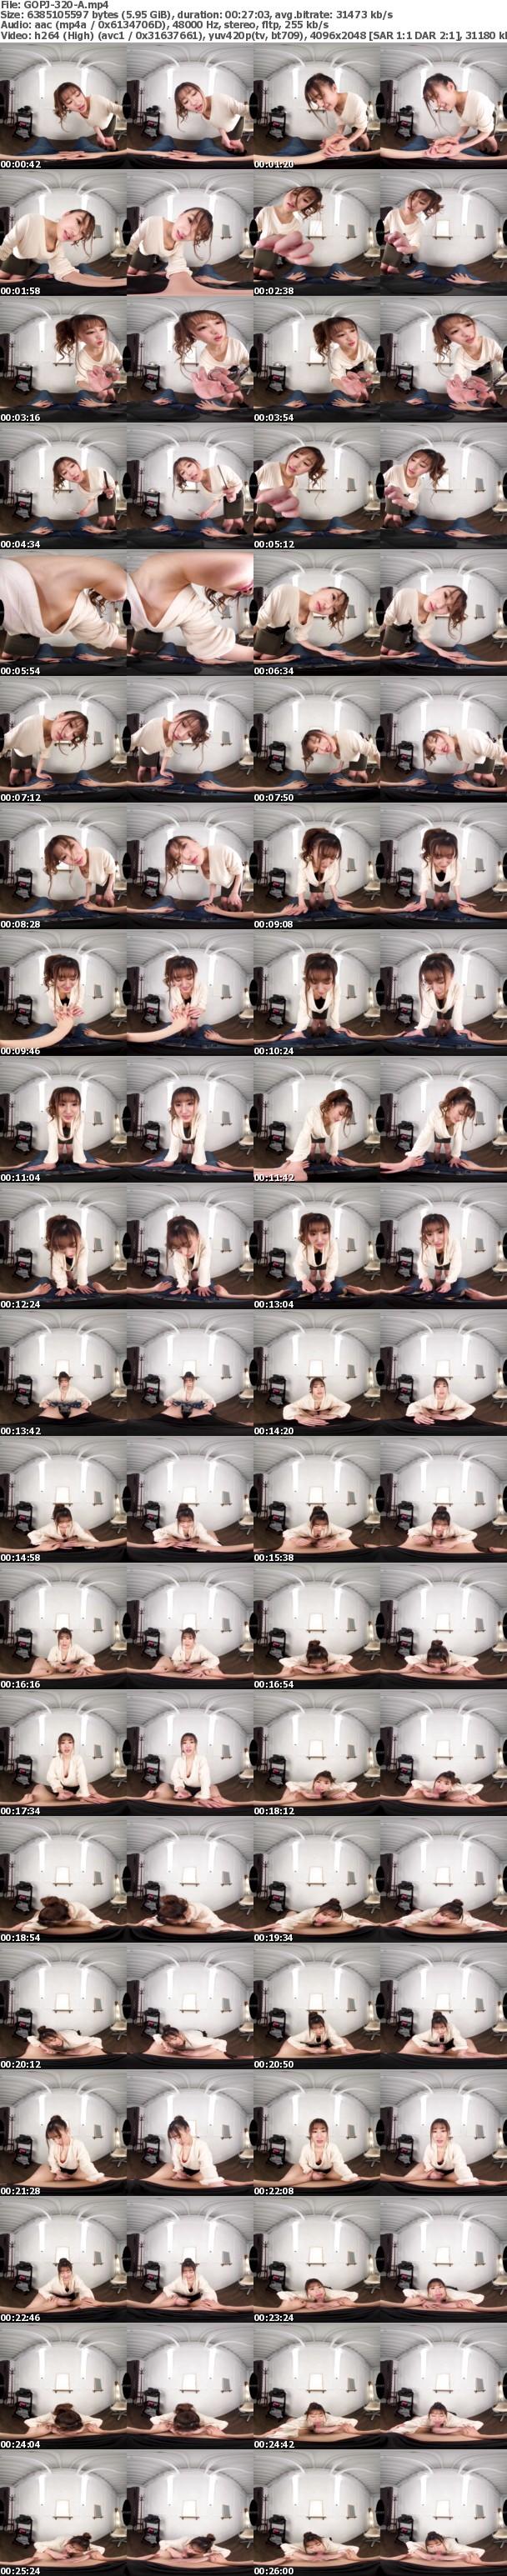 (VR) GOPJ-320 HQ 劇的超高画質 Hcup 美巨乳スタイリスト 23歳 前職:大手下着メーカー 近況:友達のカレシとエッチしちゃった///